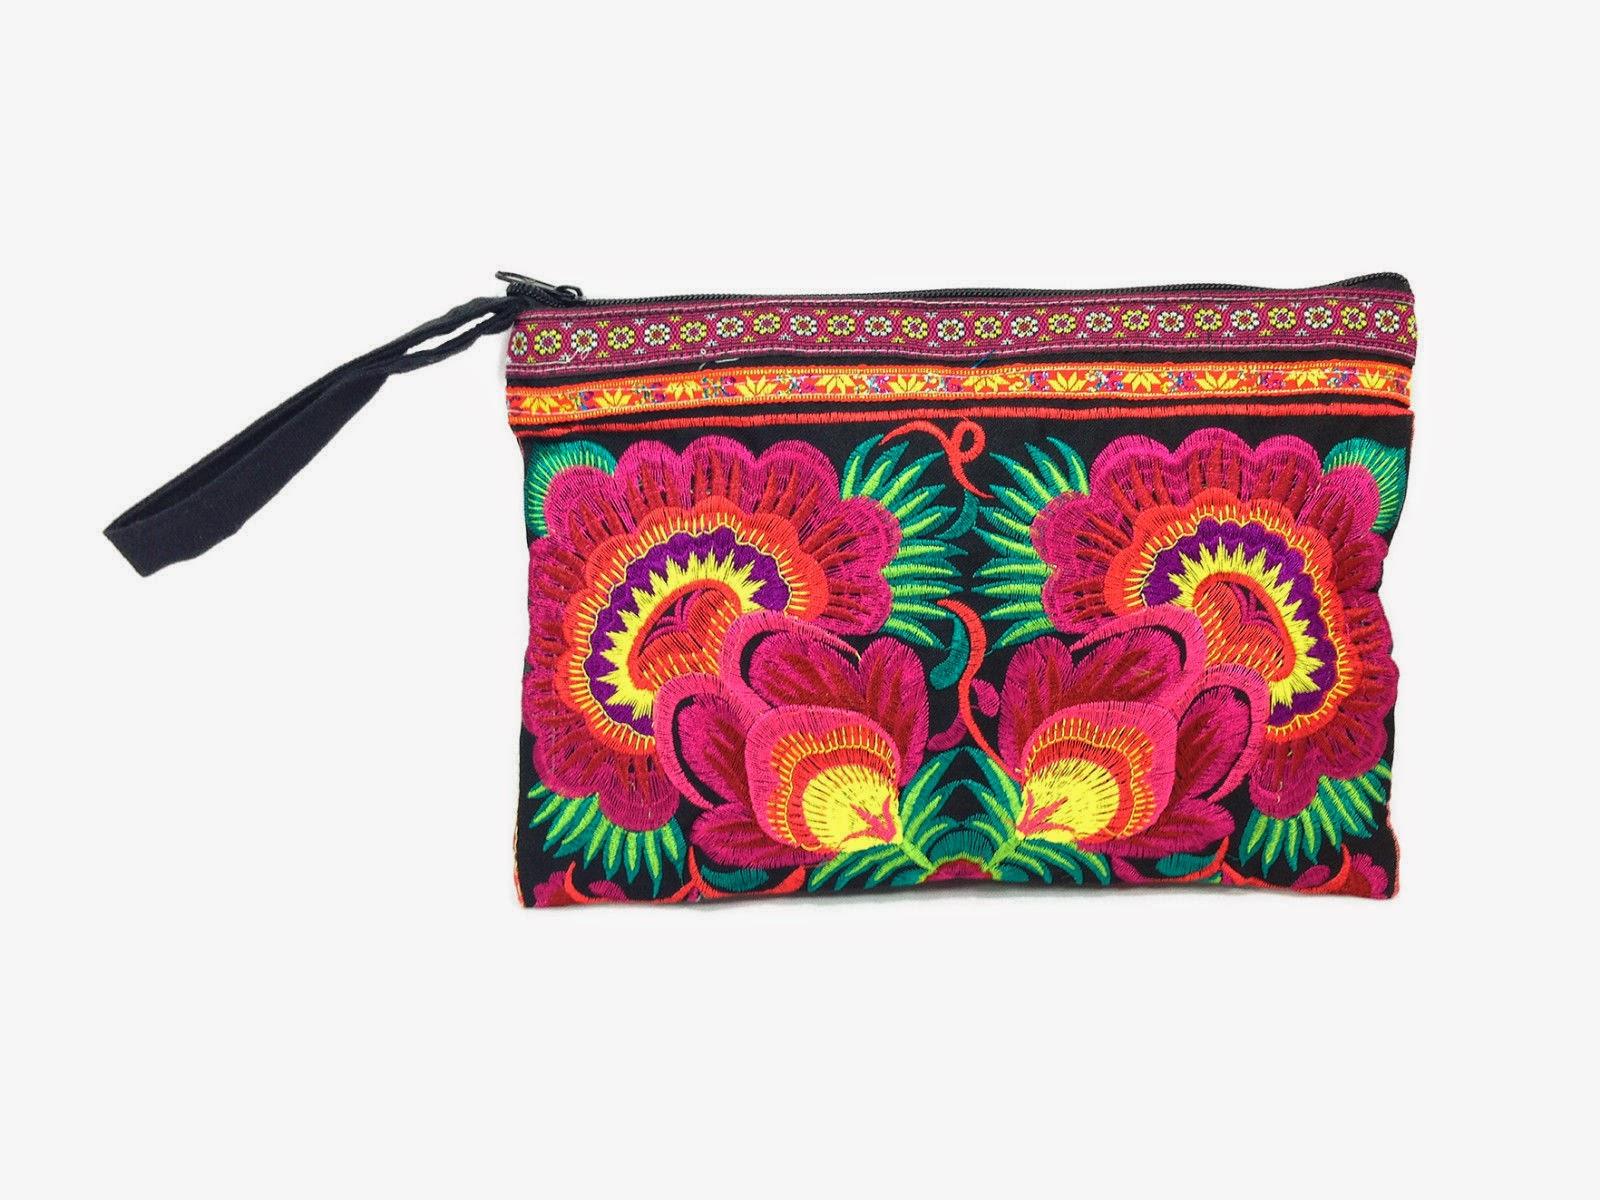 http://www.ebay.com/itm/Cute-Clutch-Bag-Handmade-Handbag-Boho-Hippie-Thai-HMONG-Tribe-Ethnic-Embroidered-/111325509533?pt=US_CSA_WH_Handbags&hash=item19eb84779d